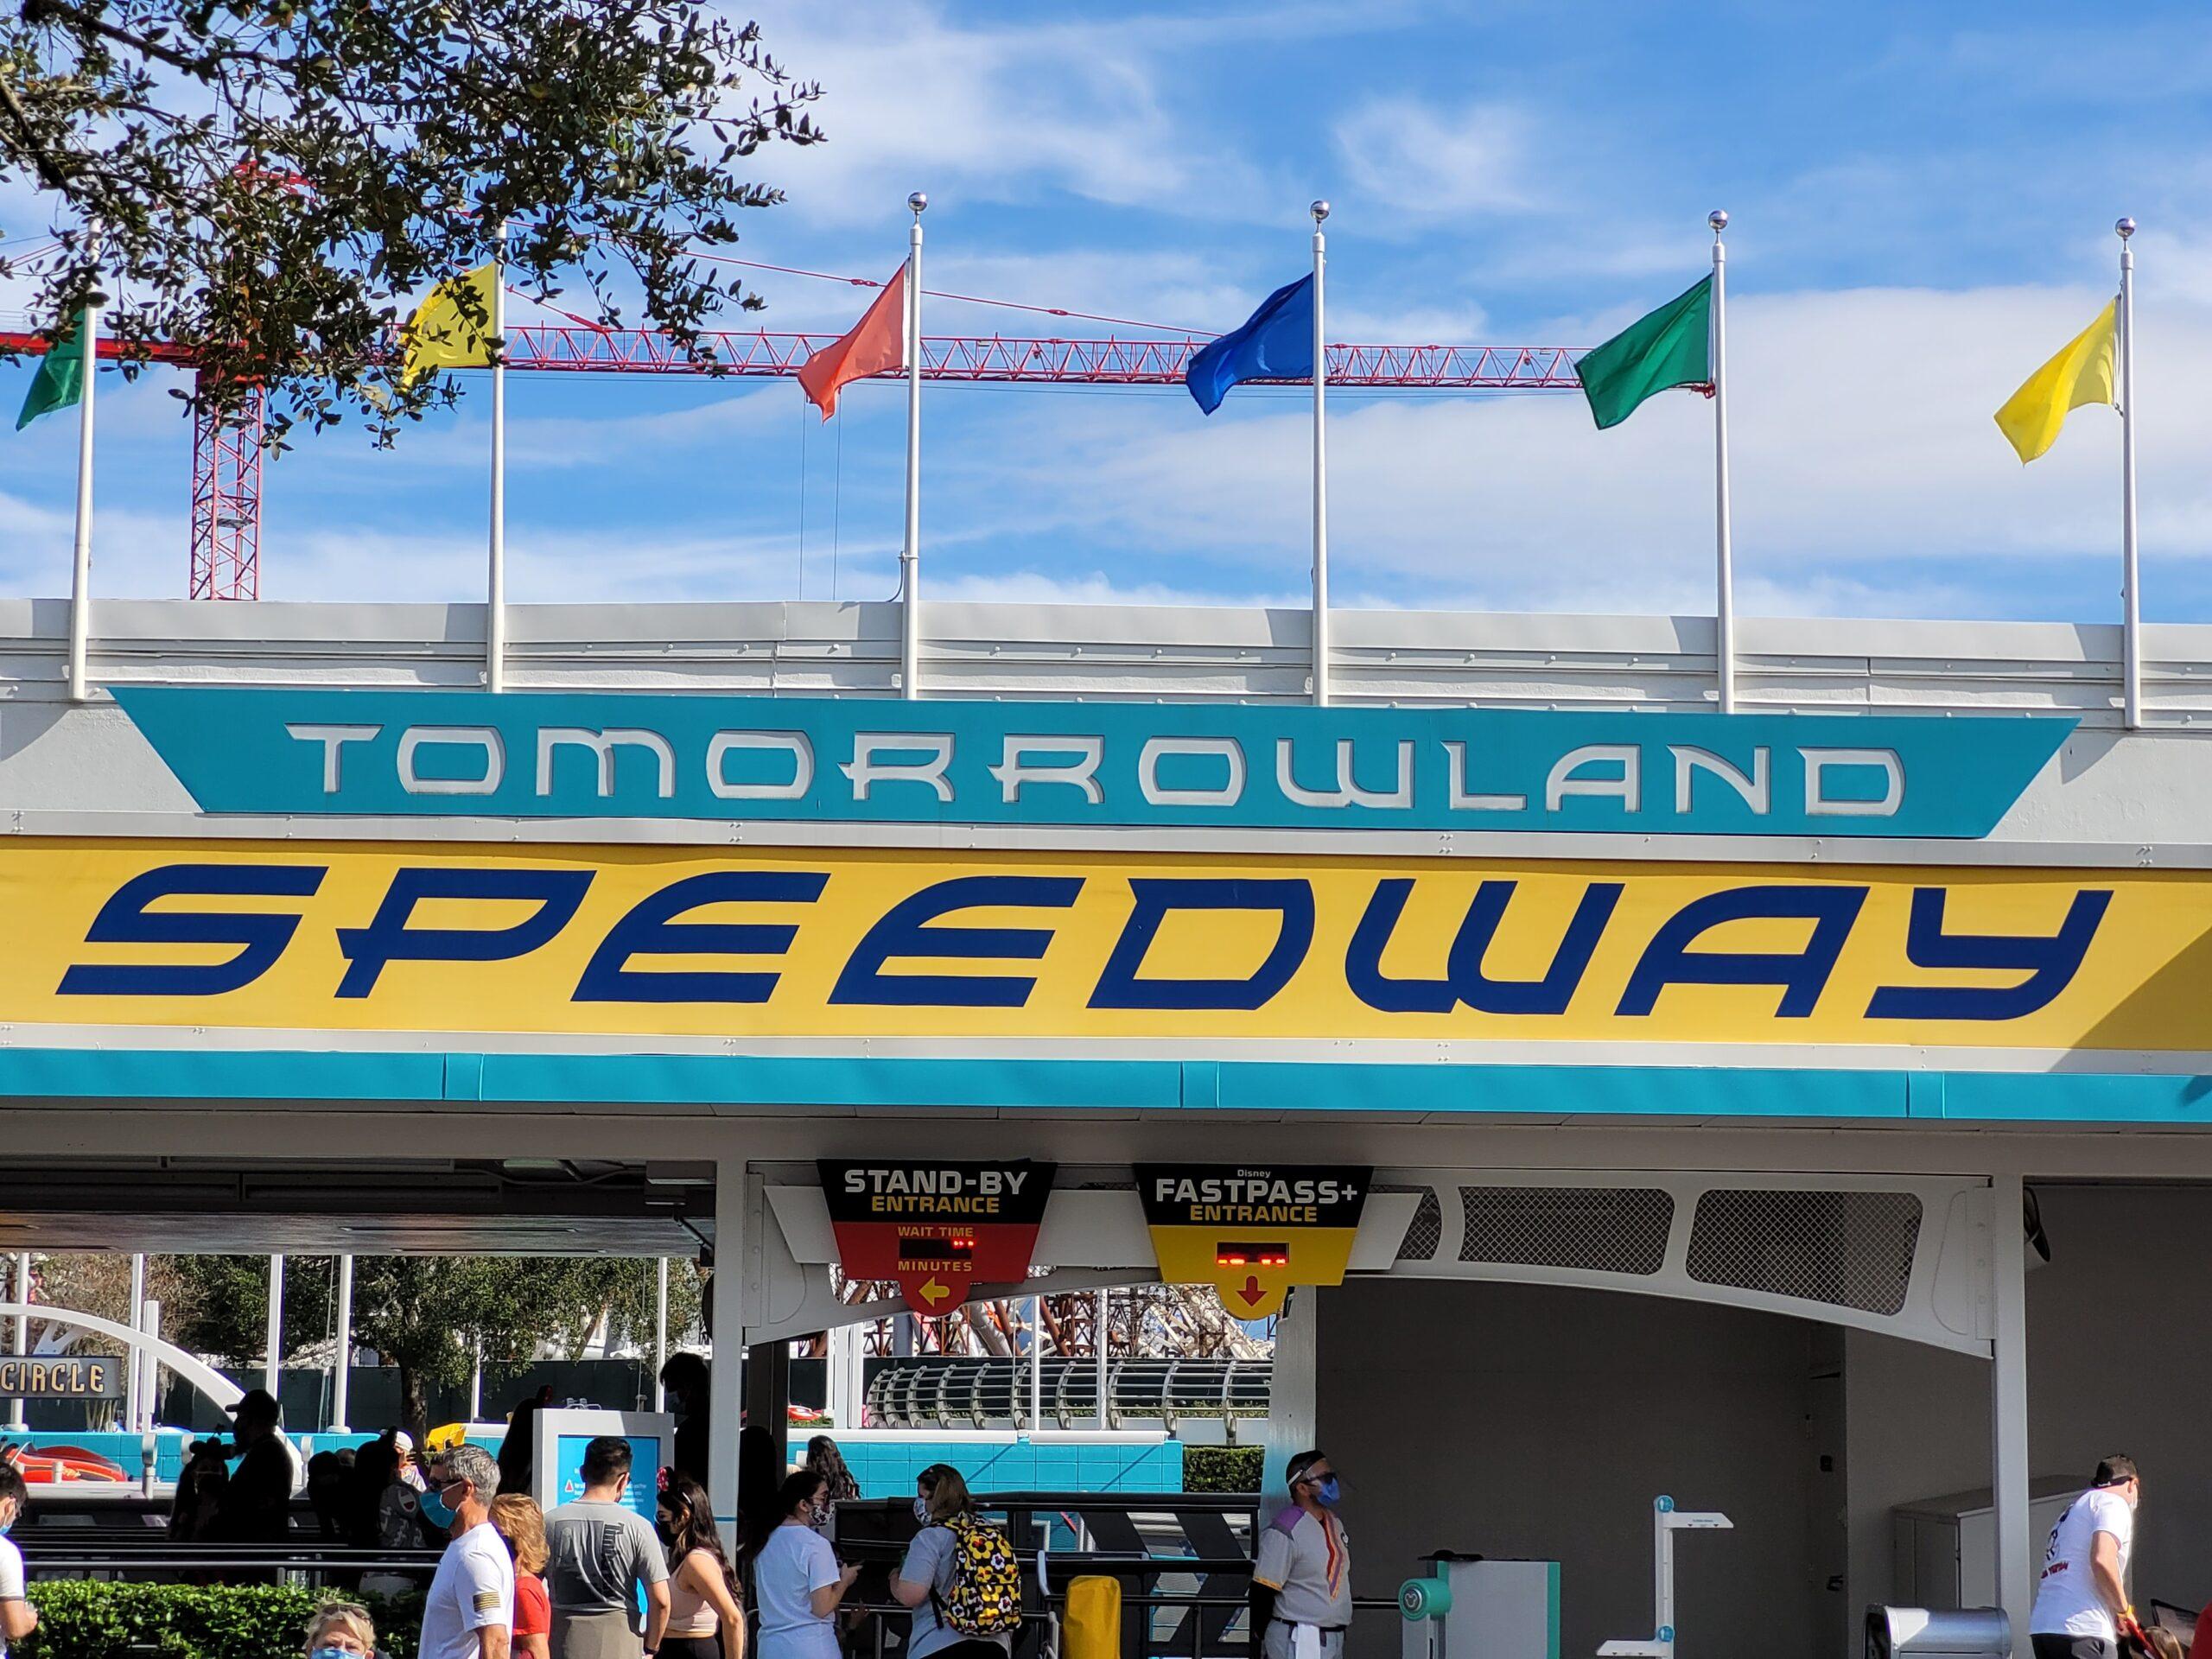 Tomorrowland Speedway Sign